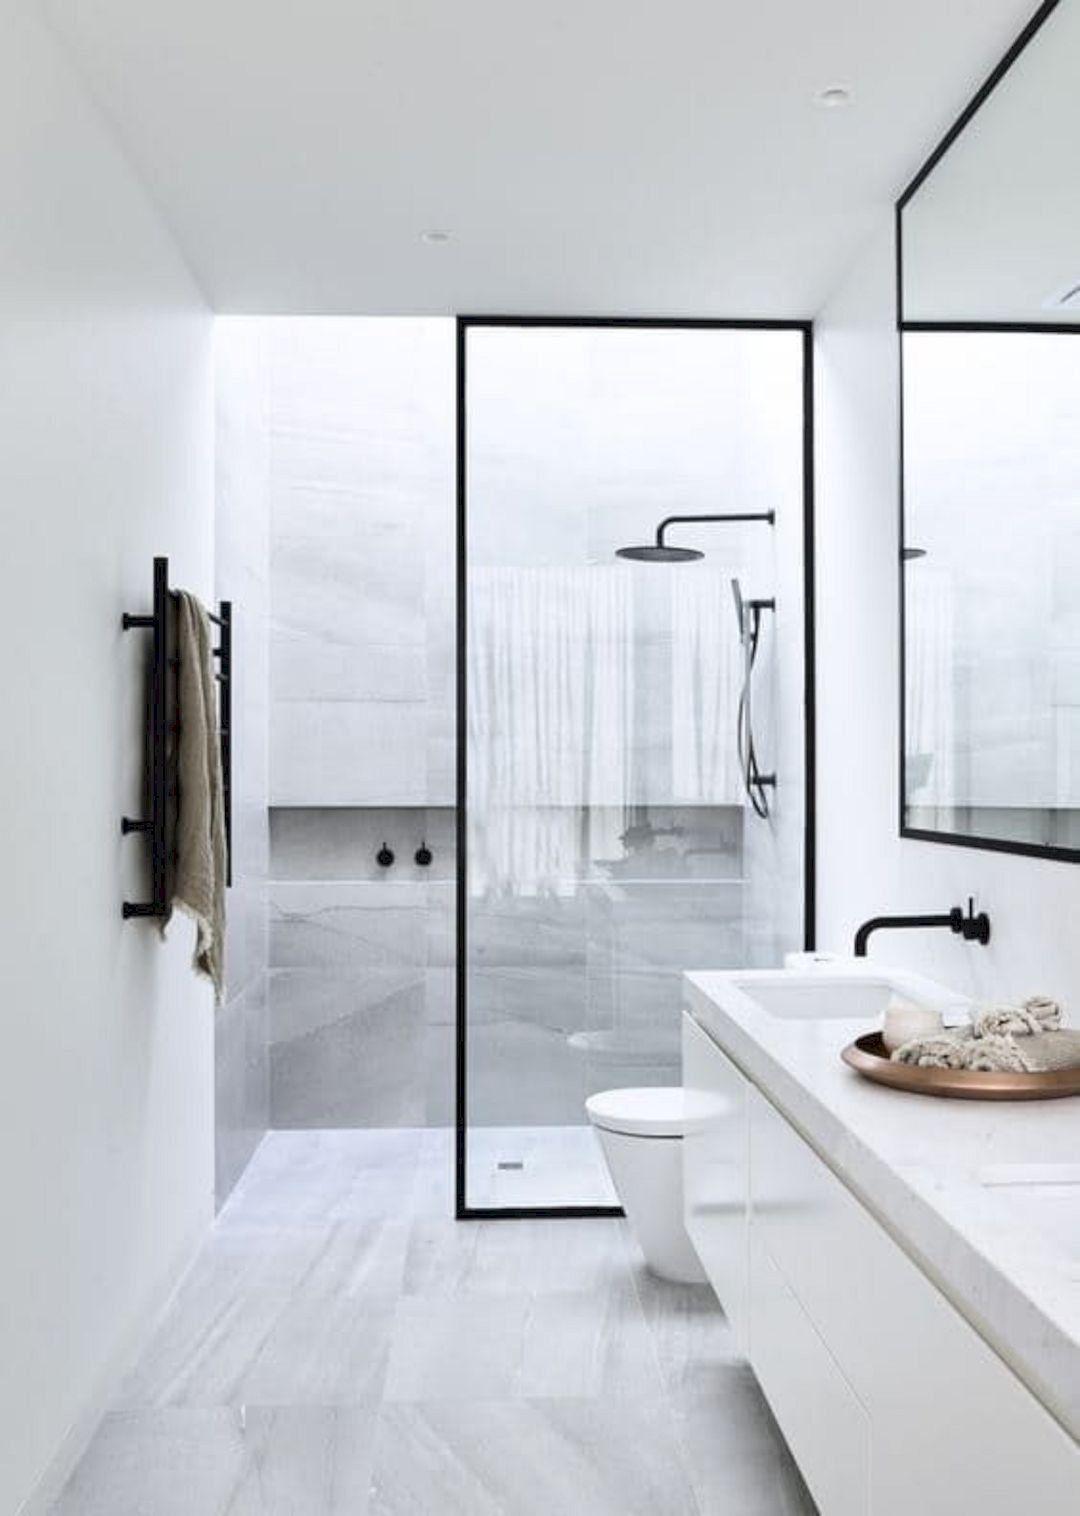 15 Ensuite Bathroom Ideas | Ensuite bathrooms, Bathroom inspiration ...